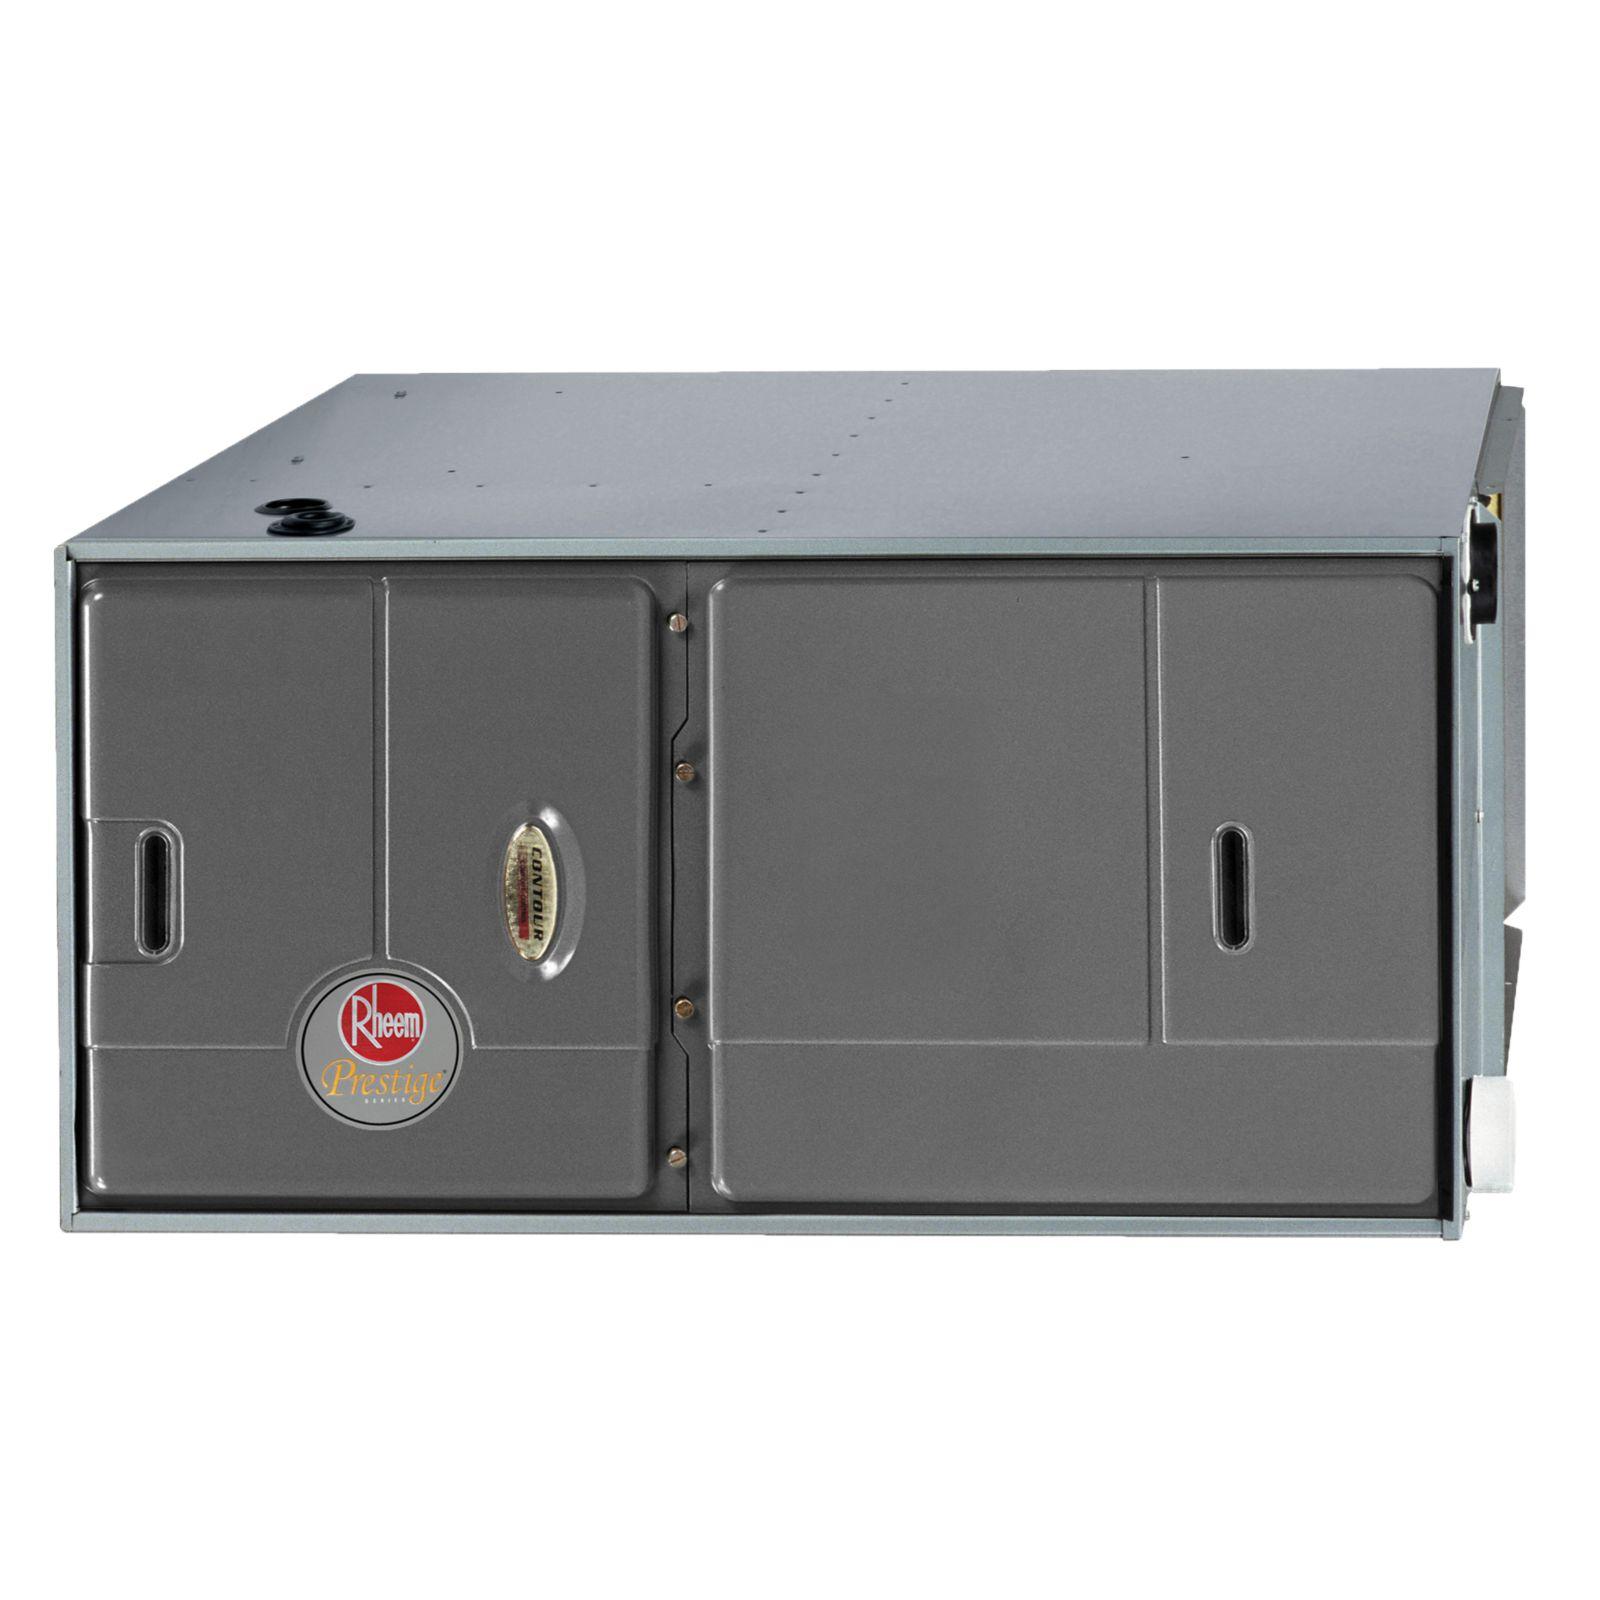 Rheem Rgjf 09ezcms Prestige Series 90 Afue Modulating 90k Btu Gas 1 X 2000 Furnaces Wiring Furnace With Comfort Control System